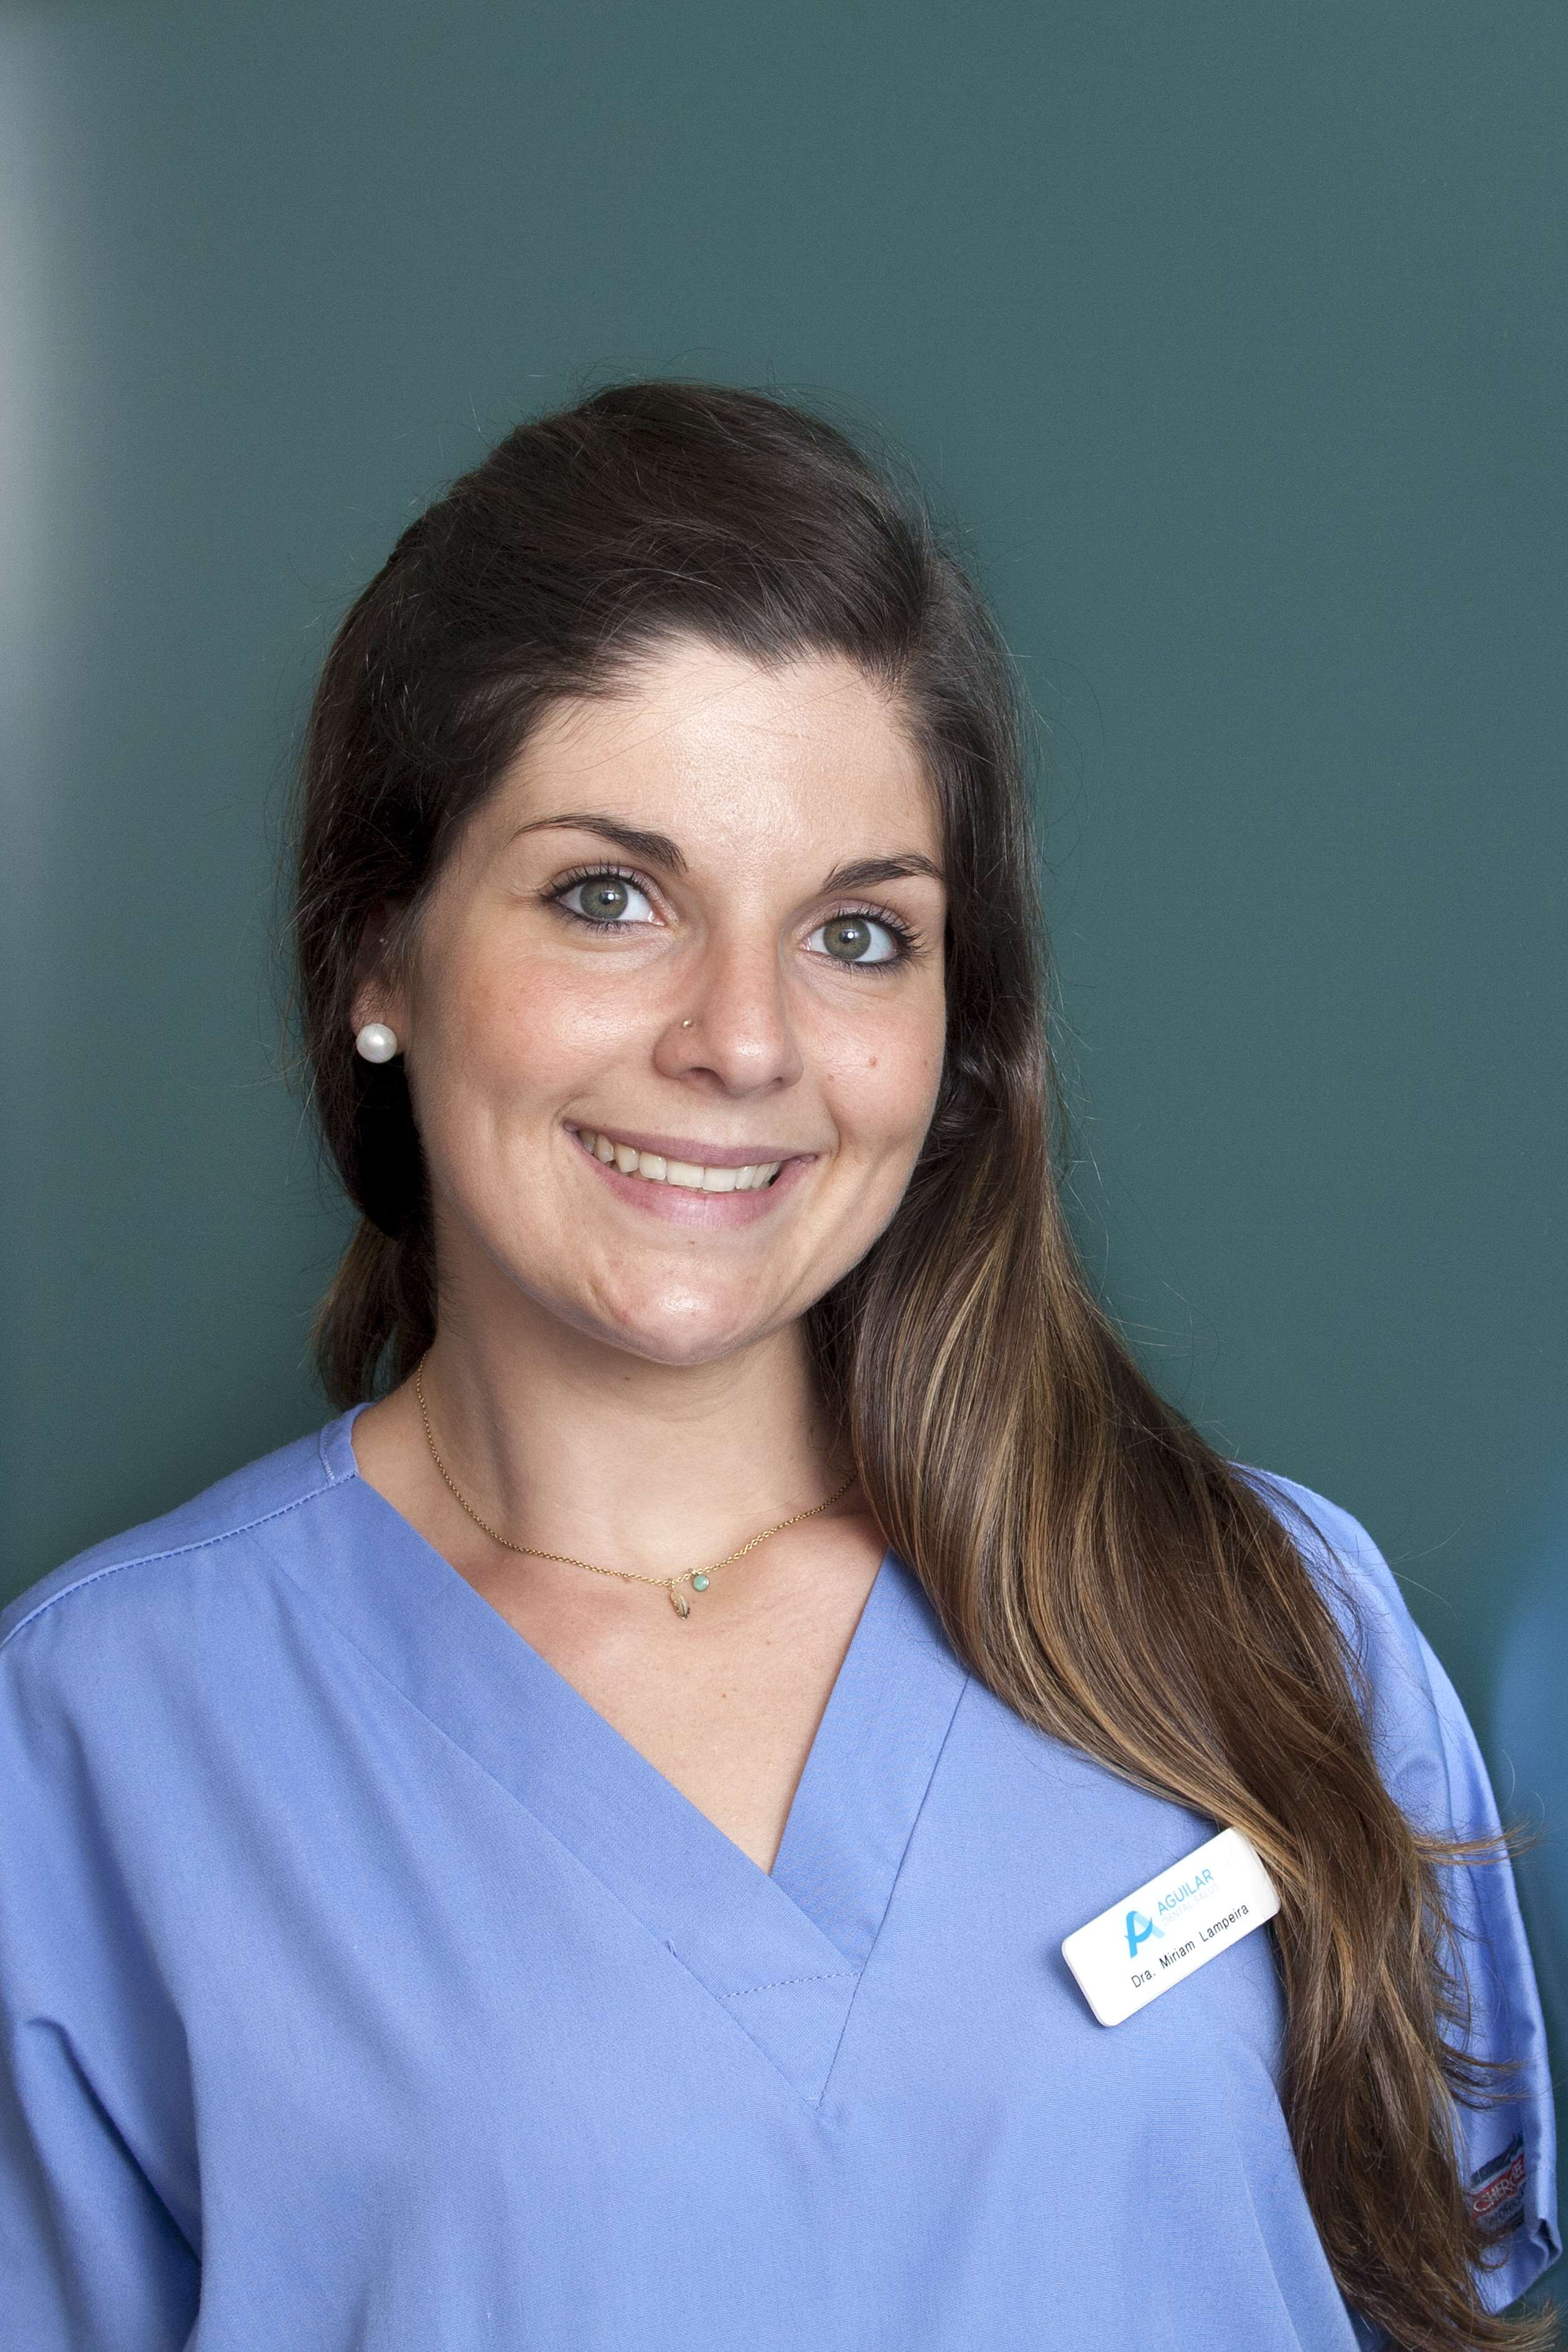 Dra. Miriam Lampeira Burriel